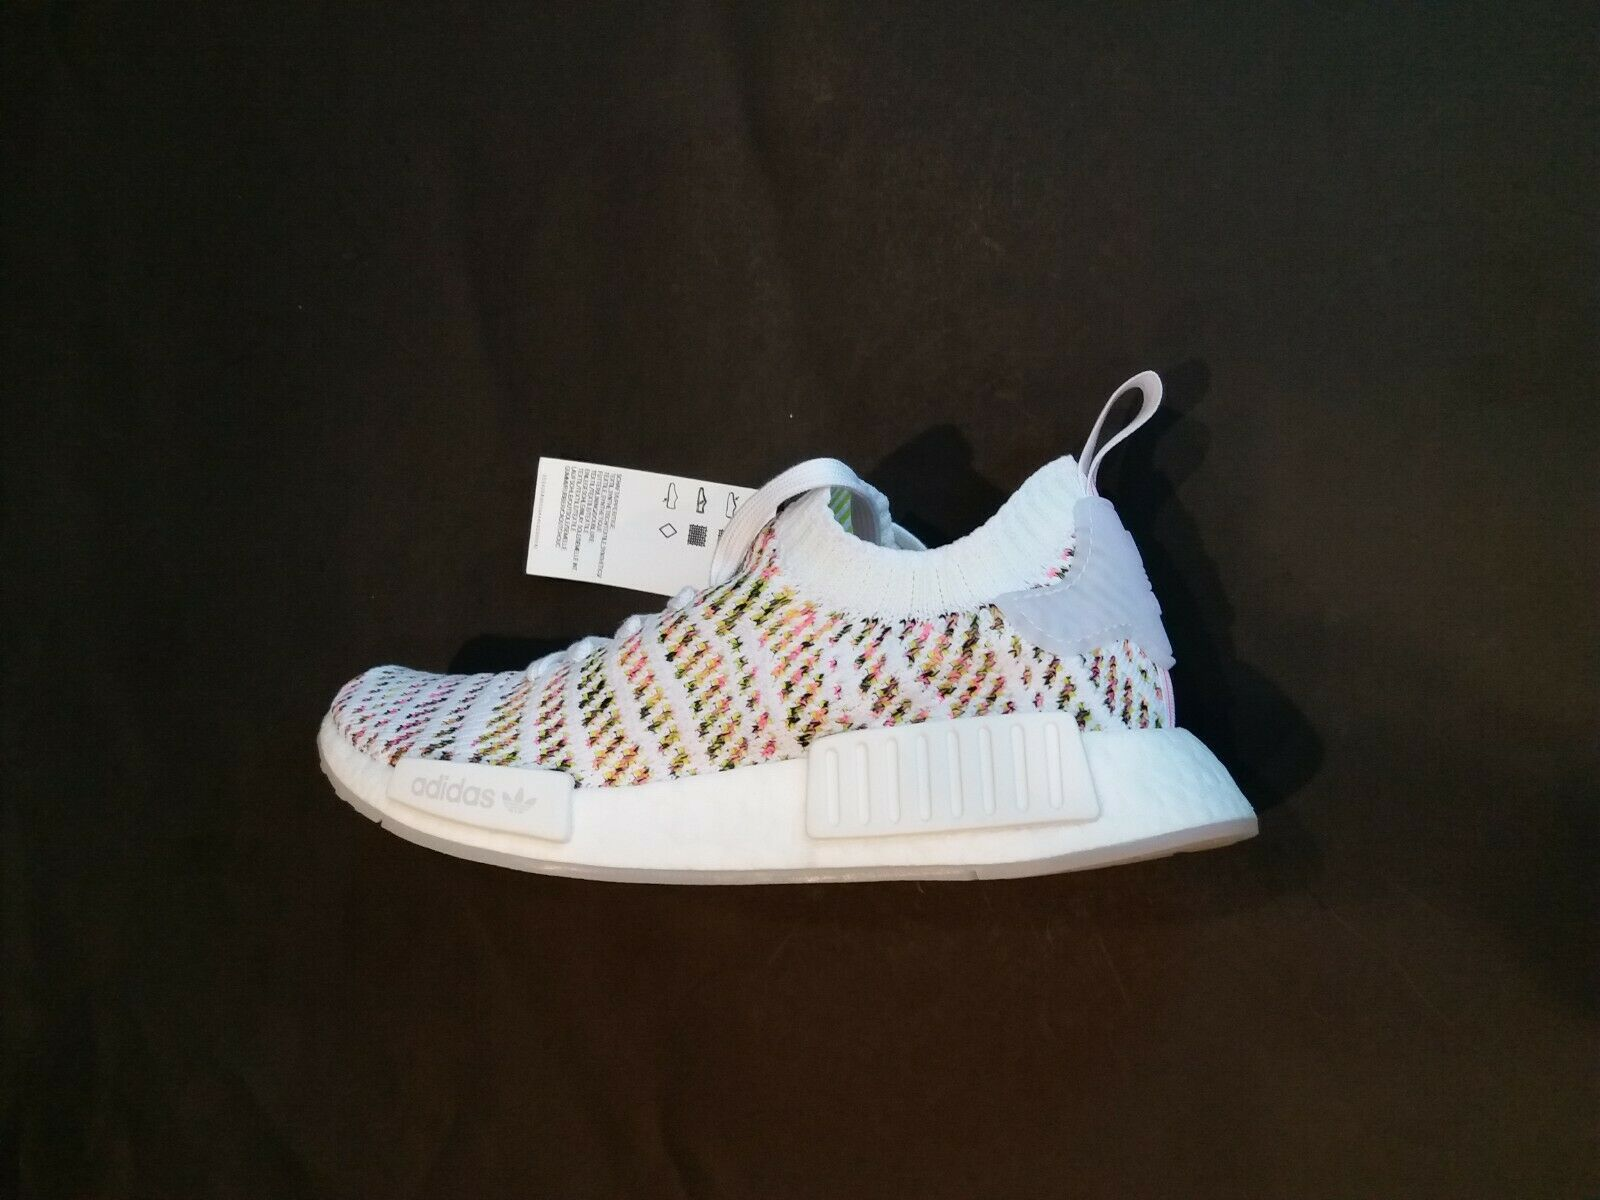 Adidas Boost NMD R1 Primeknit femme 7 Cloud blanc Solar jaune rose B43838